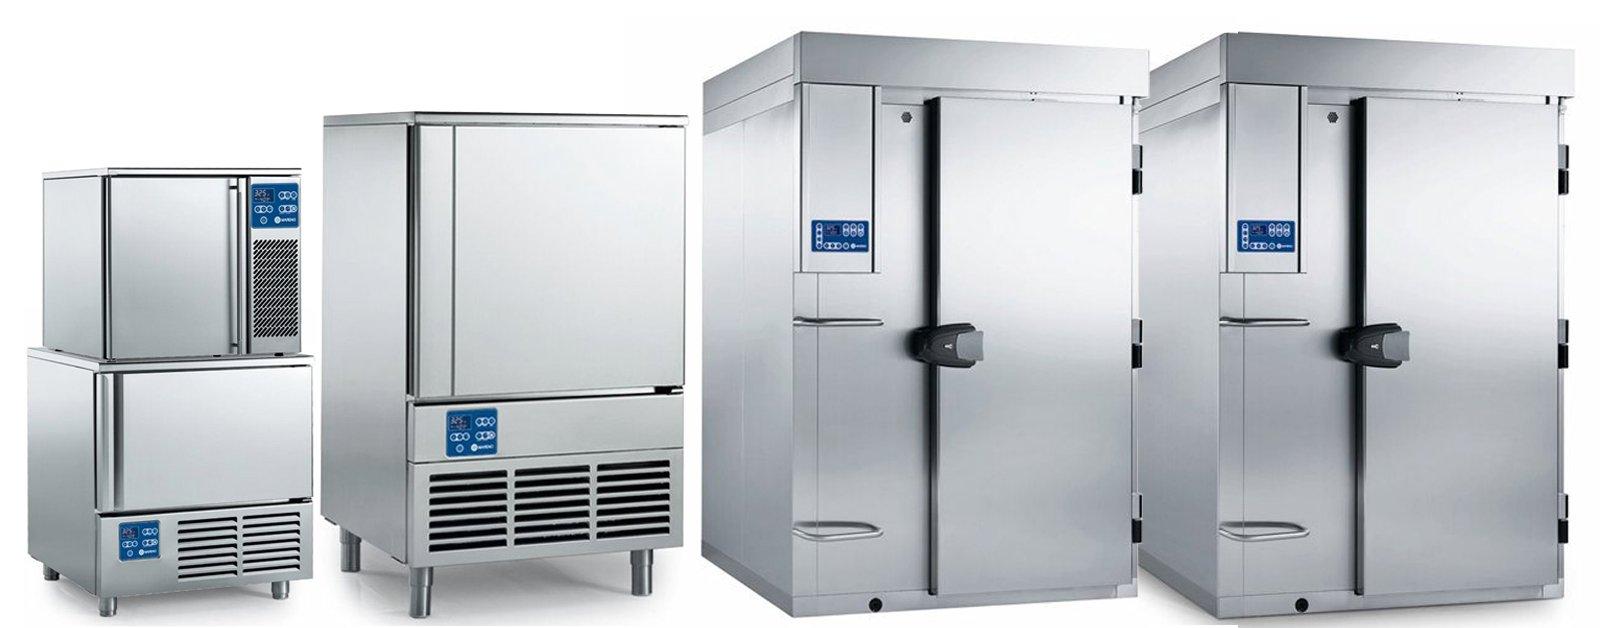 dei frigo professionali